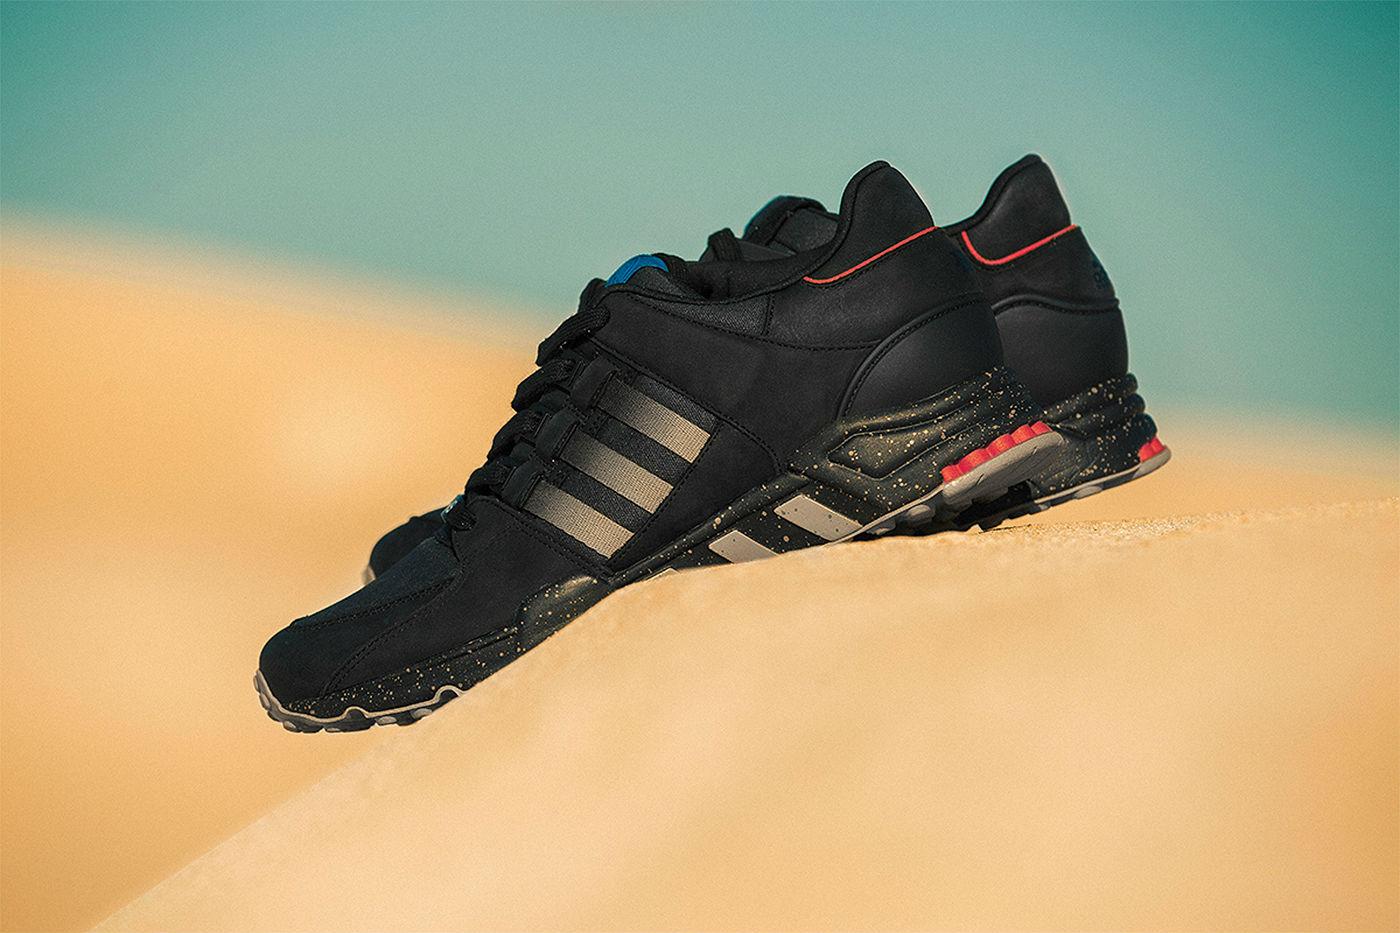 Adidas Originals x Highs and Lows EQT Support 93